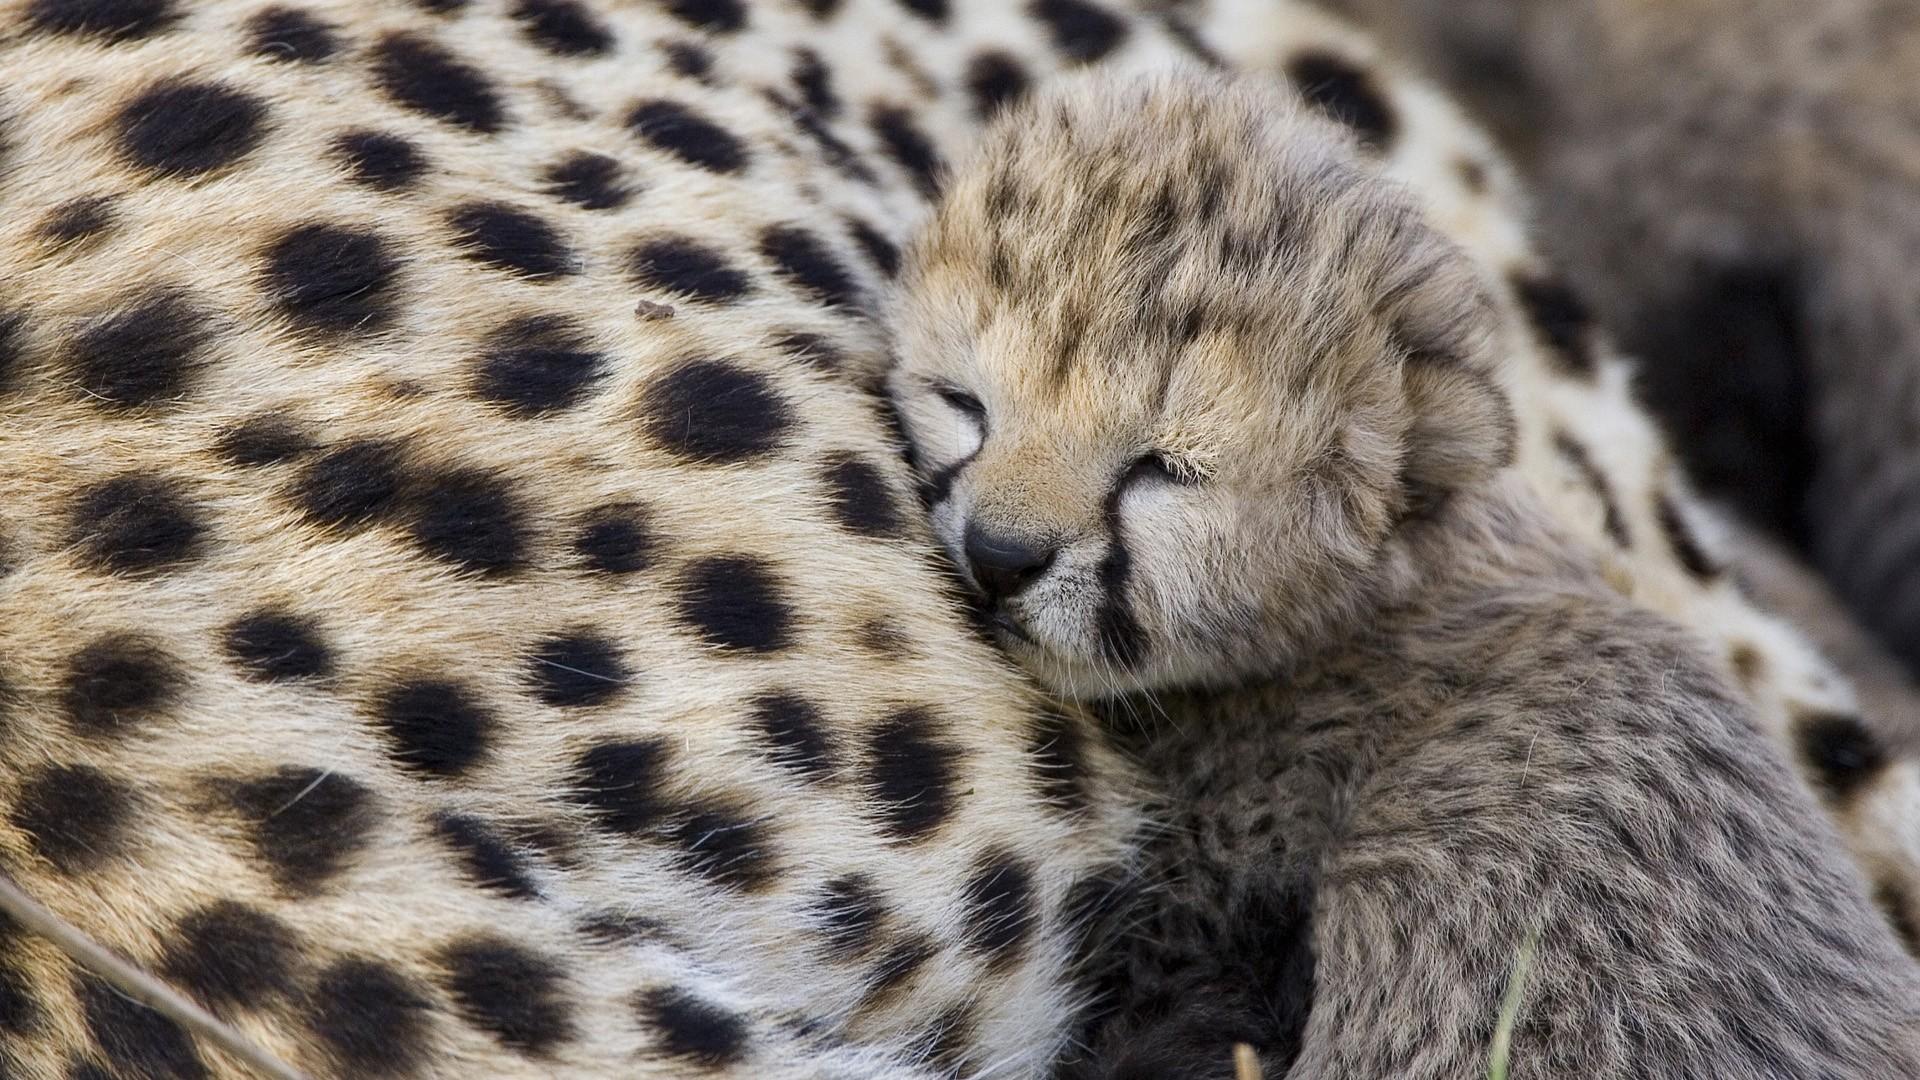 Cute Cheetah Wallpaper 57 pictures